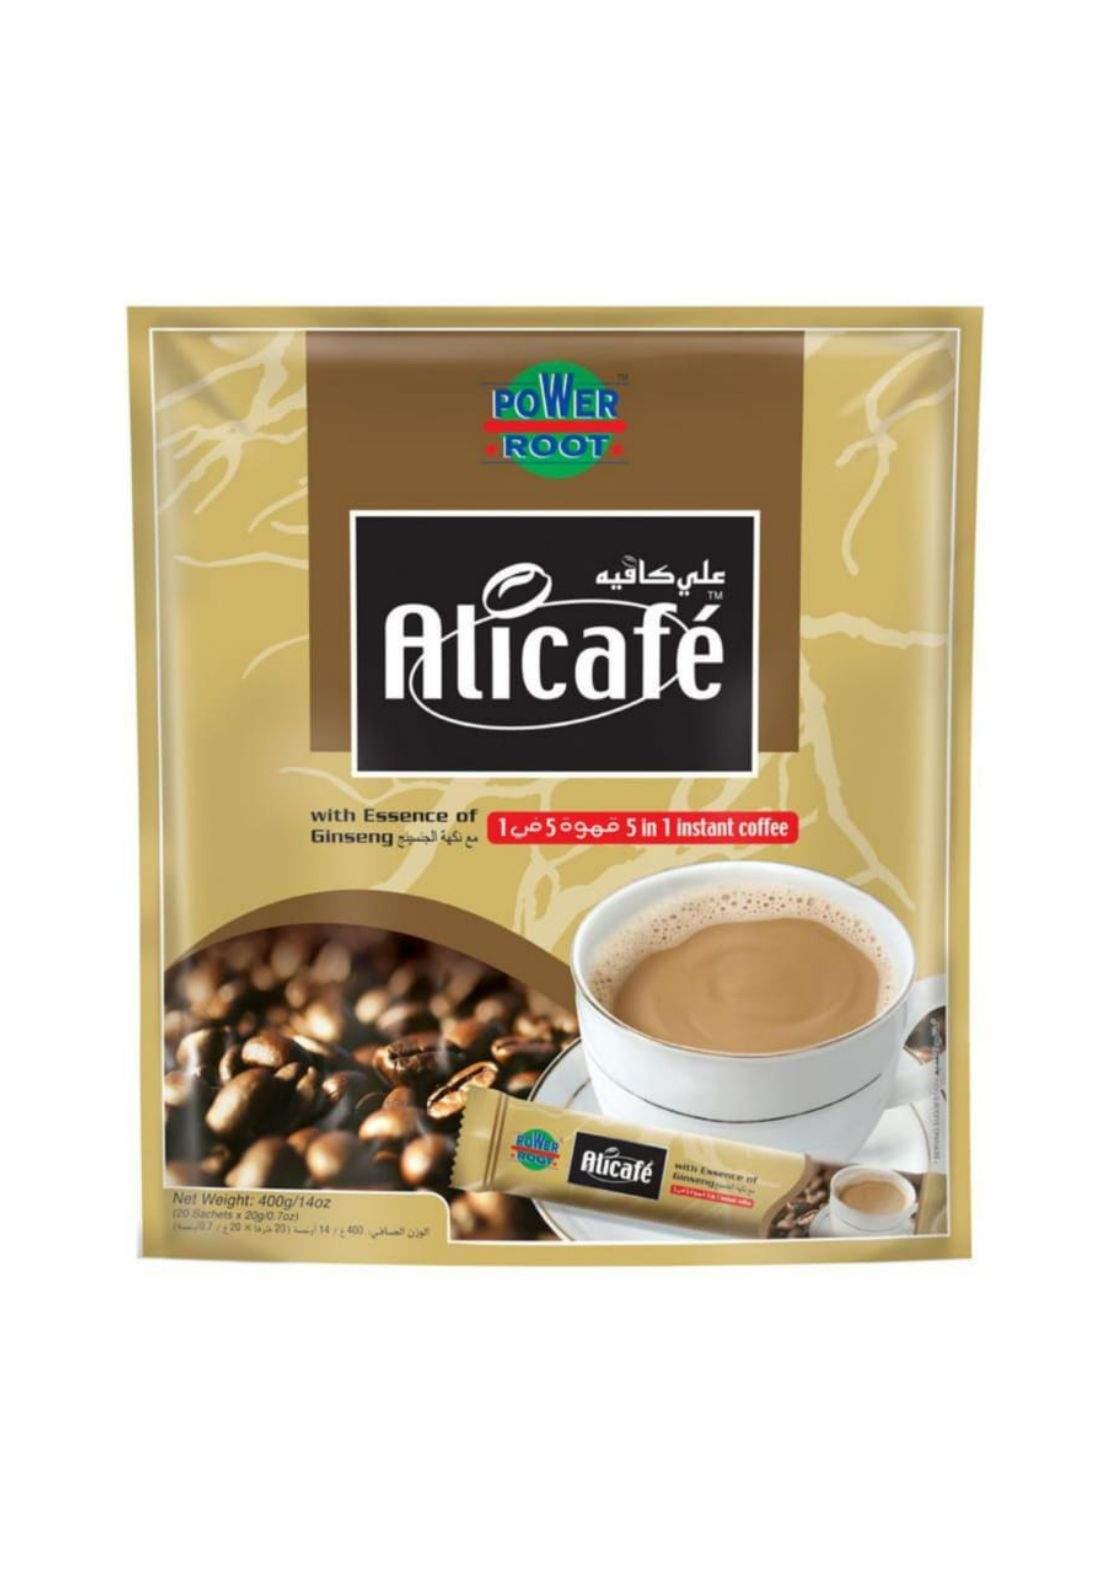 Alicafe 5in1 Instant coffee علي كافية قهوة سريعة التحضير 20 ظرف